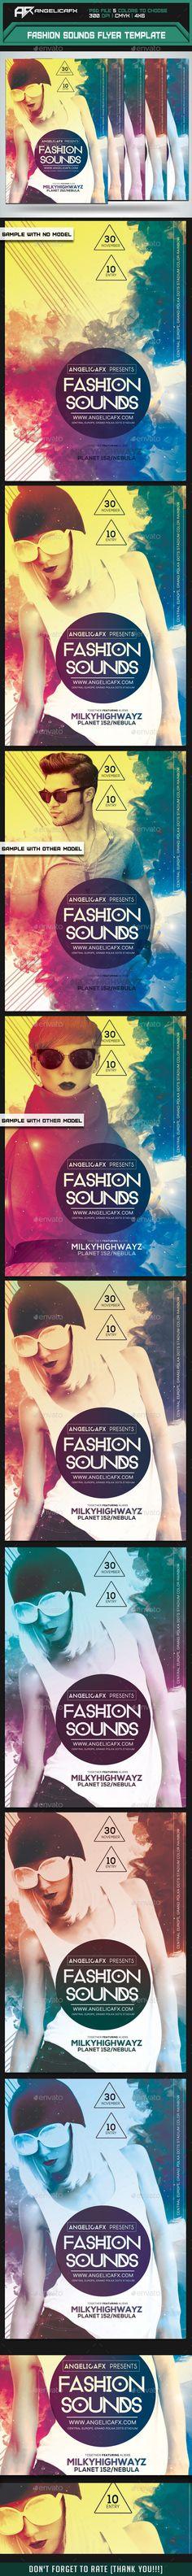 Contemporary Fashion Flyer Poster A4 Vol 2 Fashion, 2! and Flyers - contemporary flyer